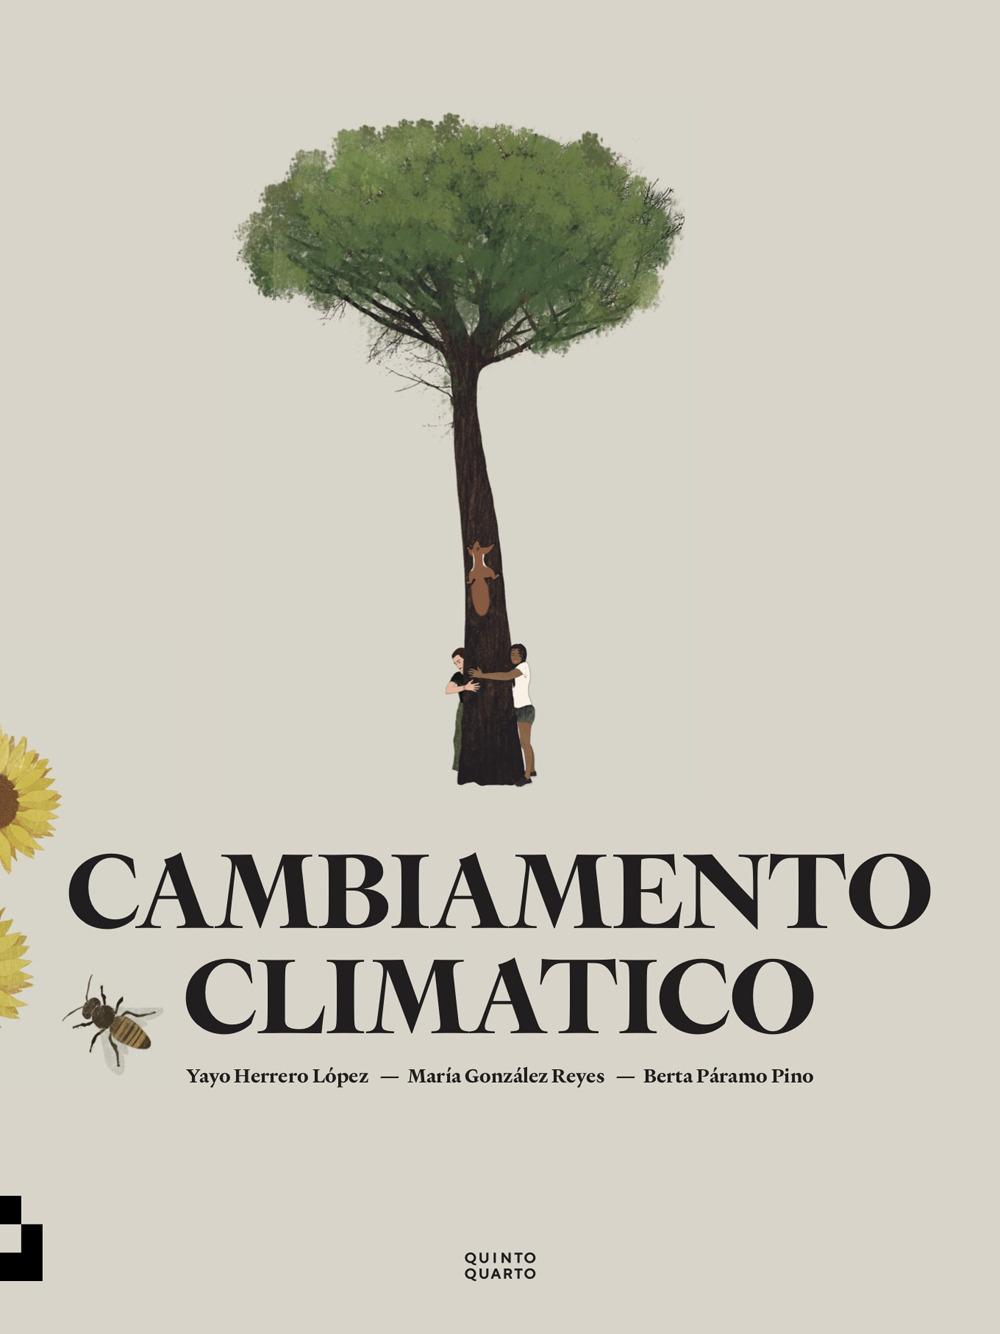 CAMBIAMENTO CLIMATICO - Lòpez Yayo Herrero; Gonzàlez Reyes Maria; Paramo Pino Berta - 9788885546219